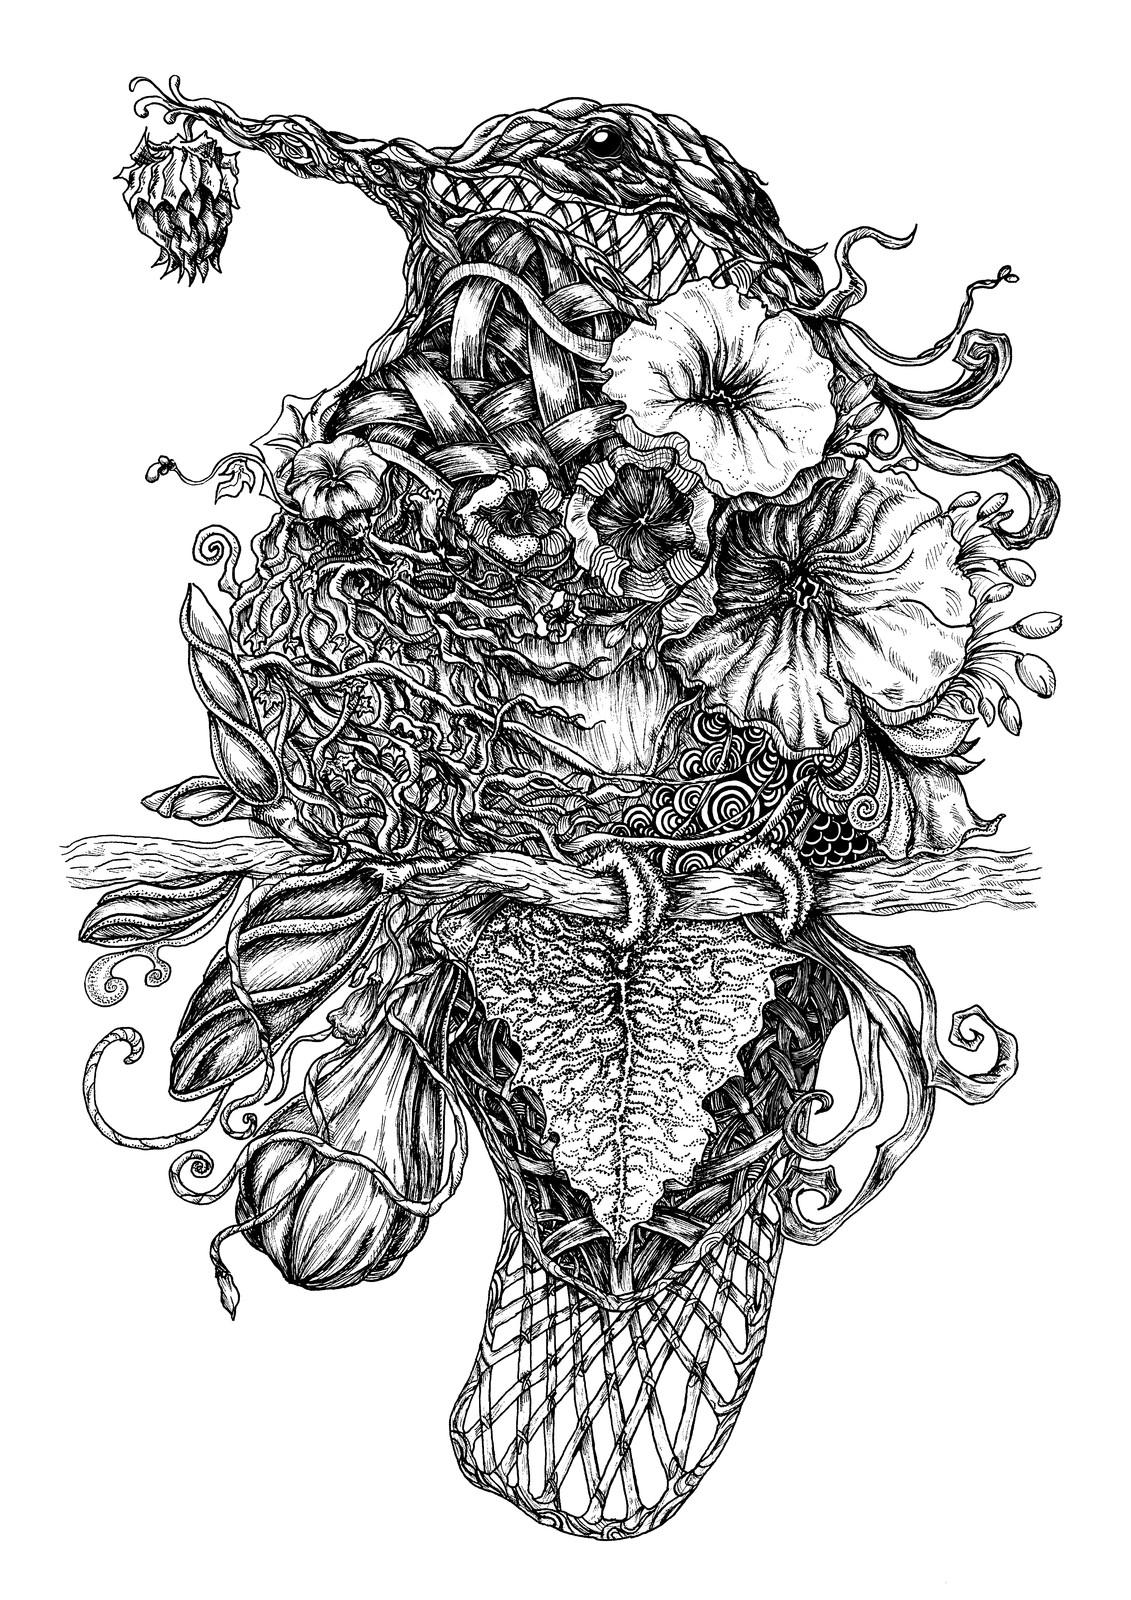 A2_42.0 x 59.4cm_ Watercolour paper